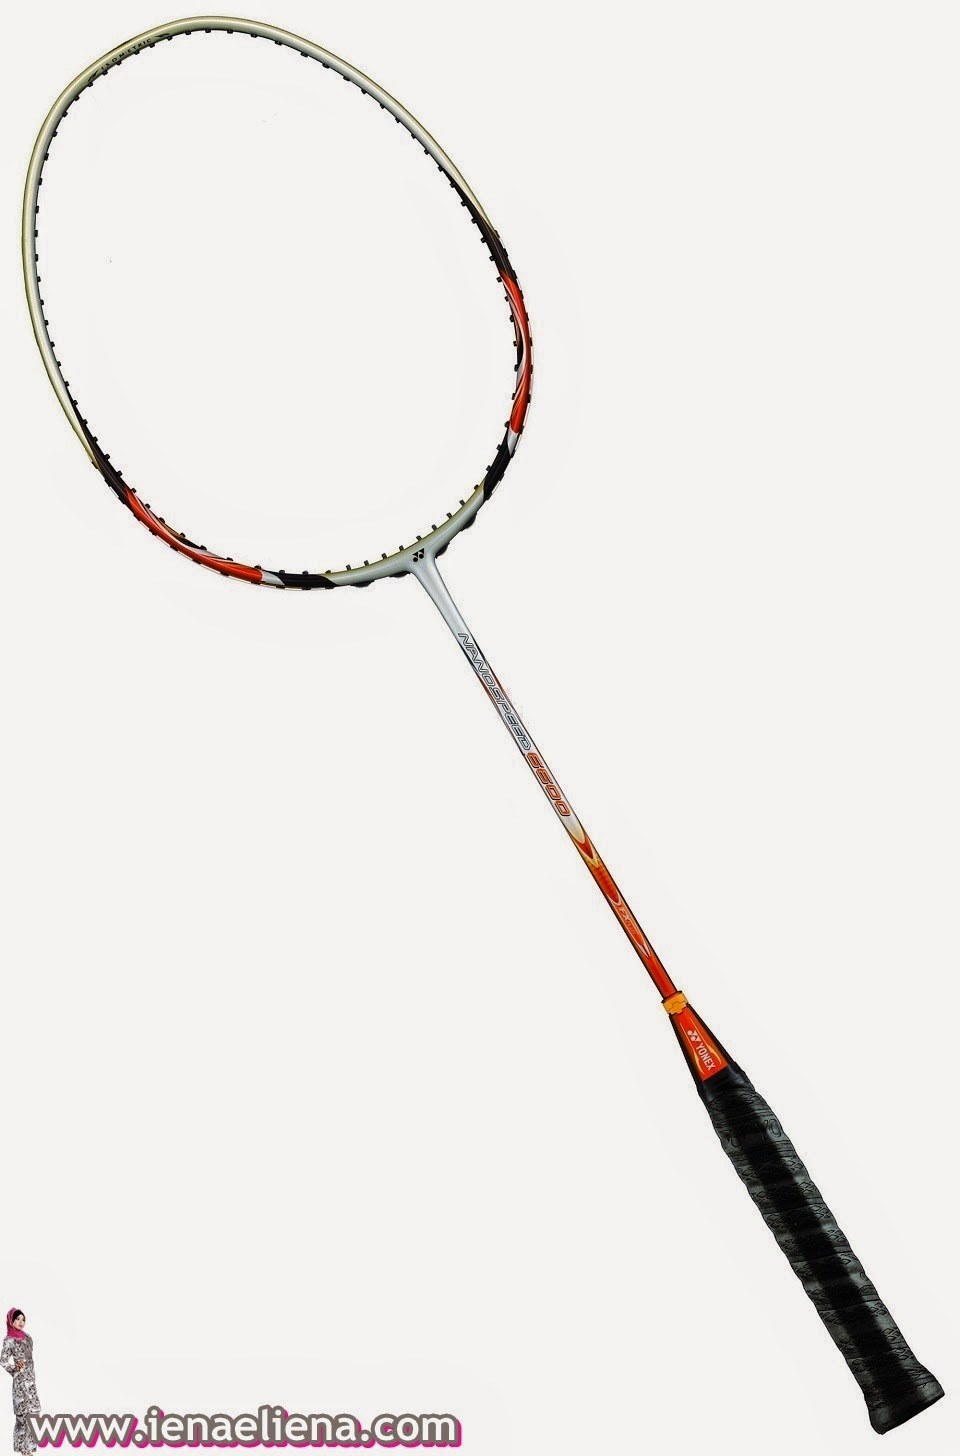 Raket badminton murah online dating 9